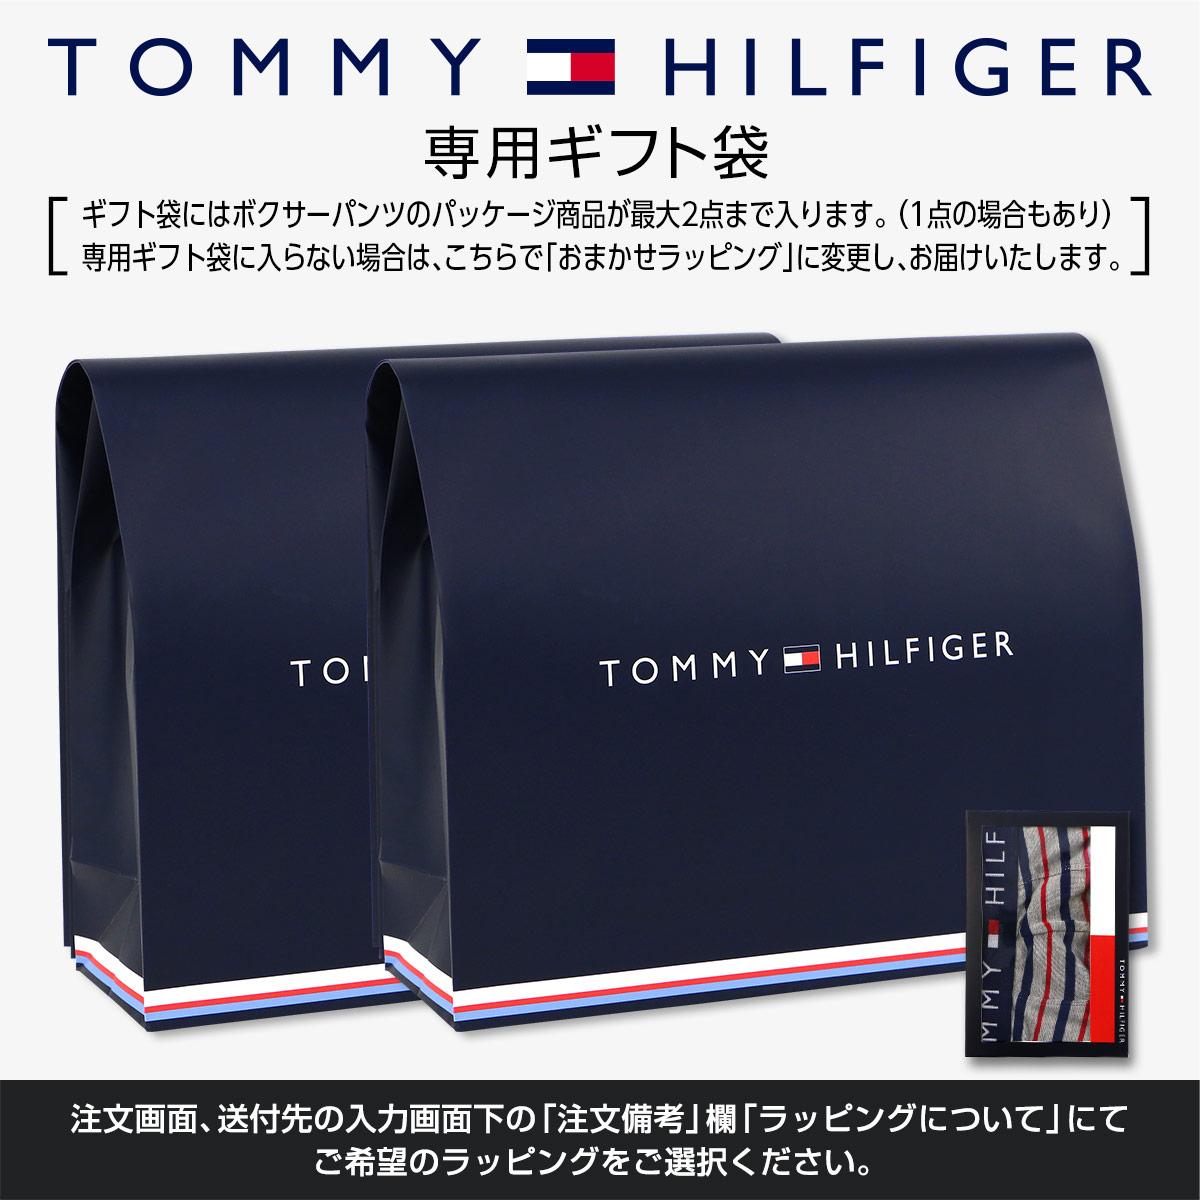 TOMMY HILFIGER|トミーヒルフィガー  TOMMY ORIGINAL MICRO TRUNK トミー オリジナル マイクロ トランク ボクサーパンツ 男性 メンズ 53301360【ゆうパケット・2点まで】